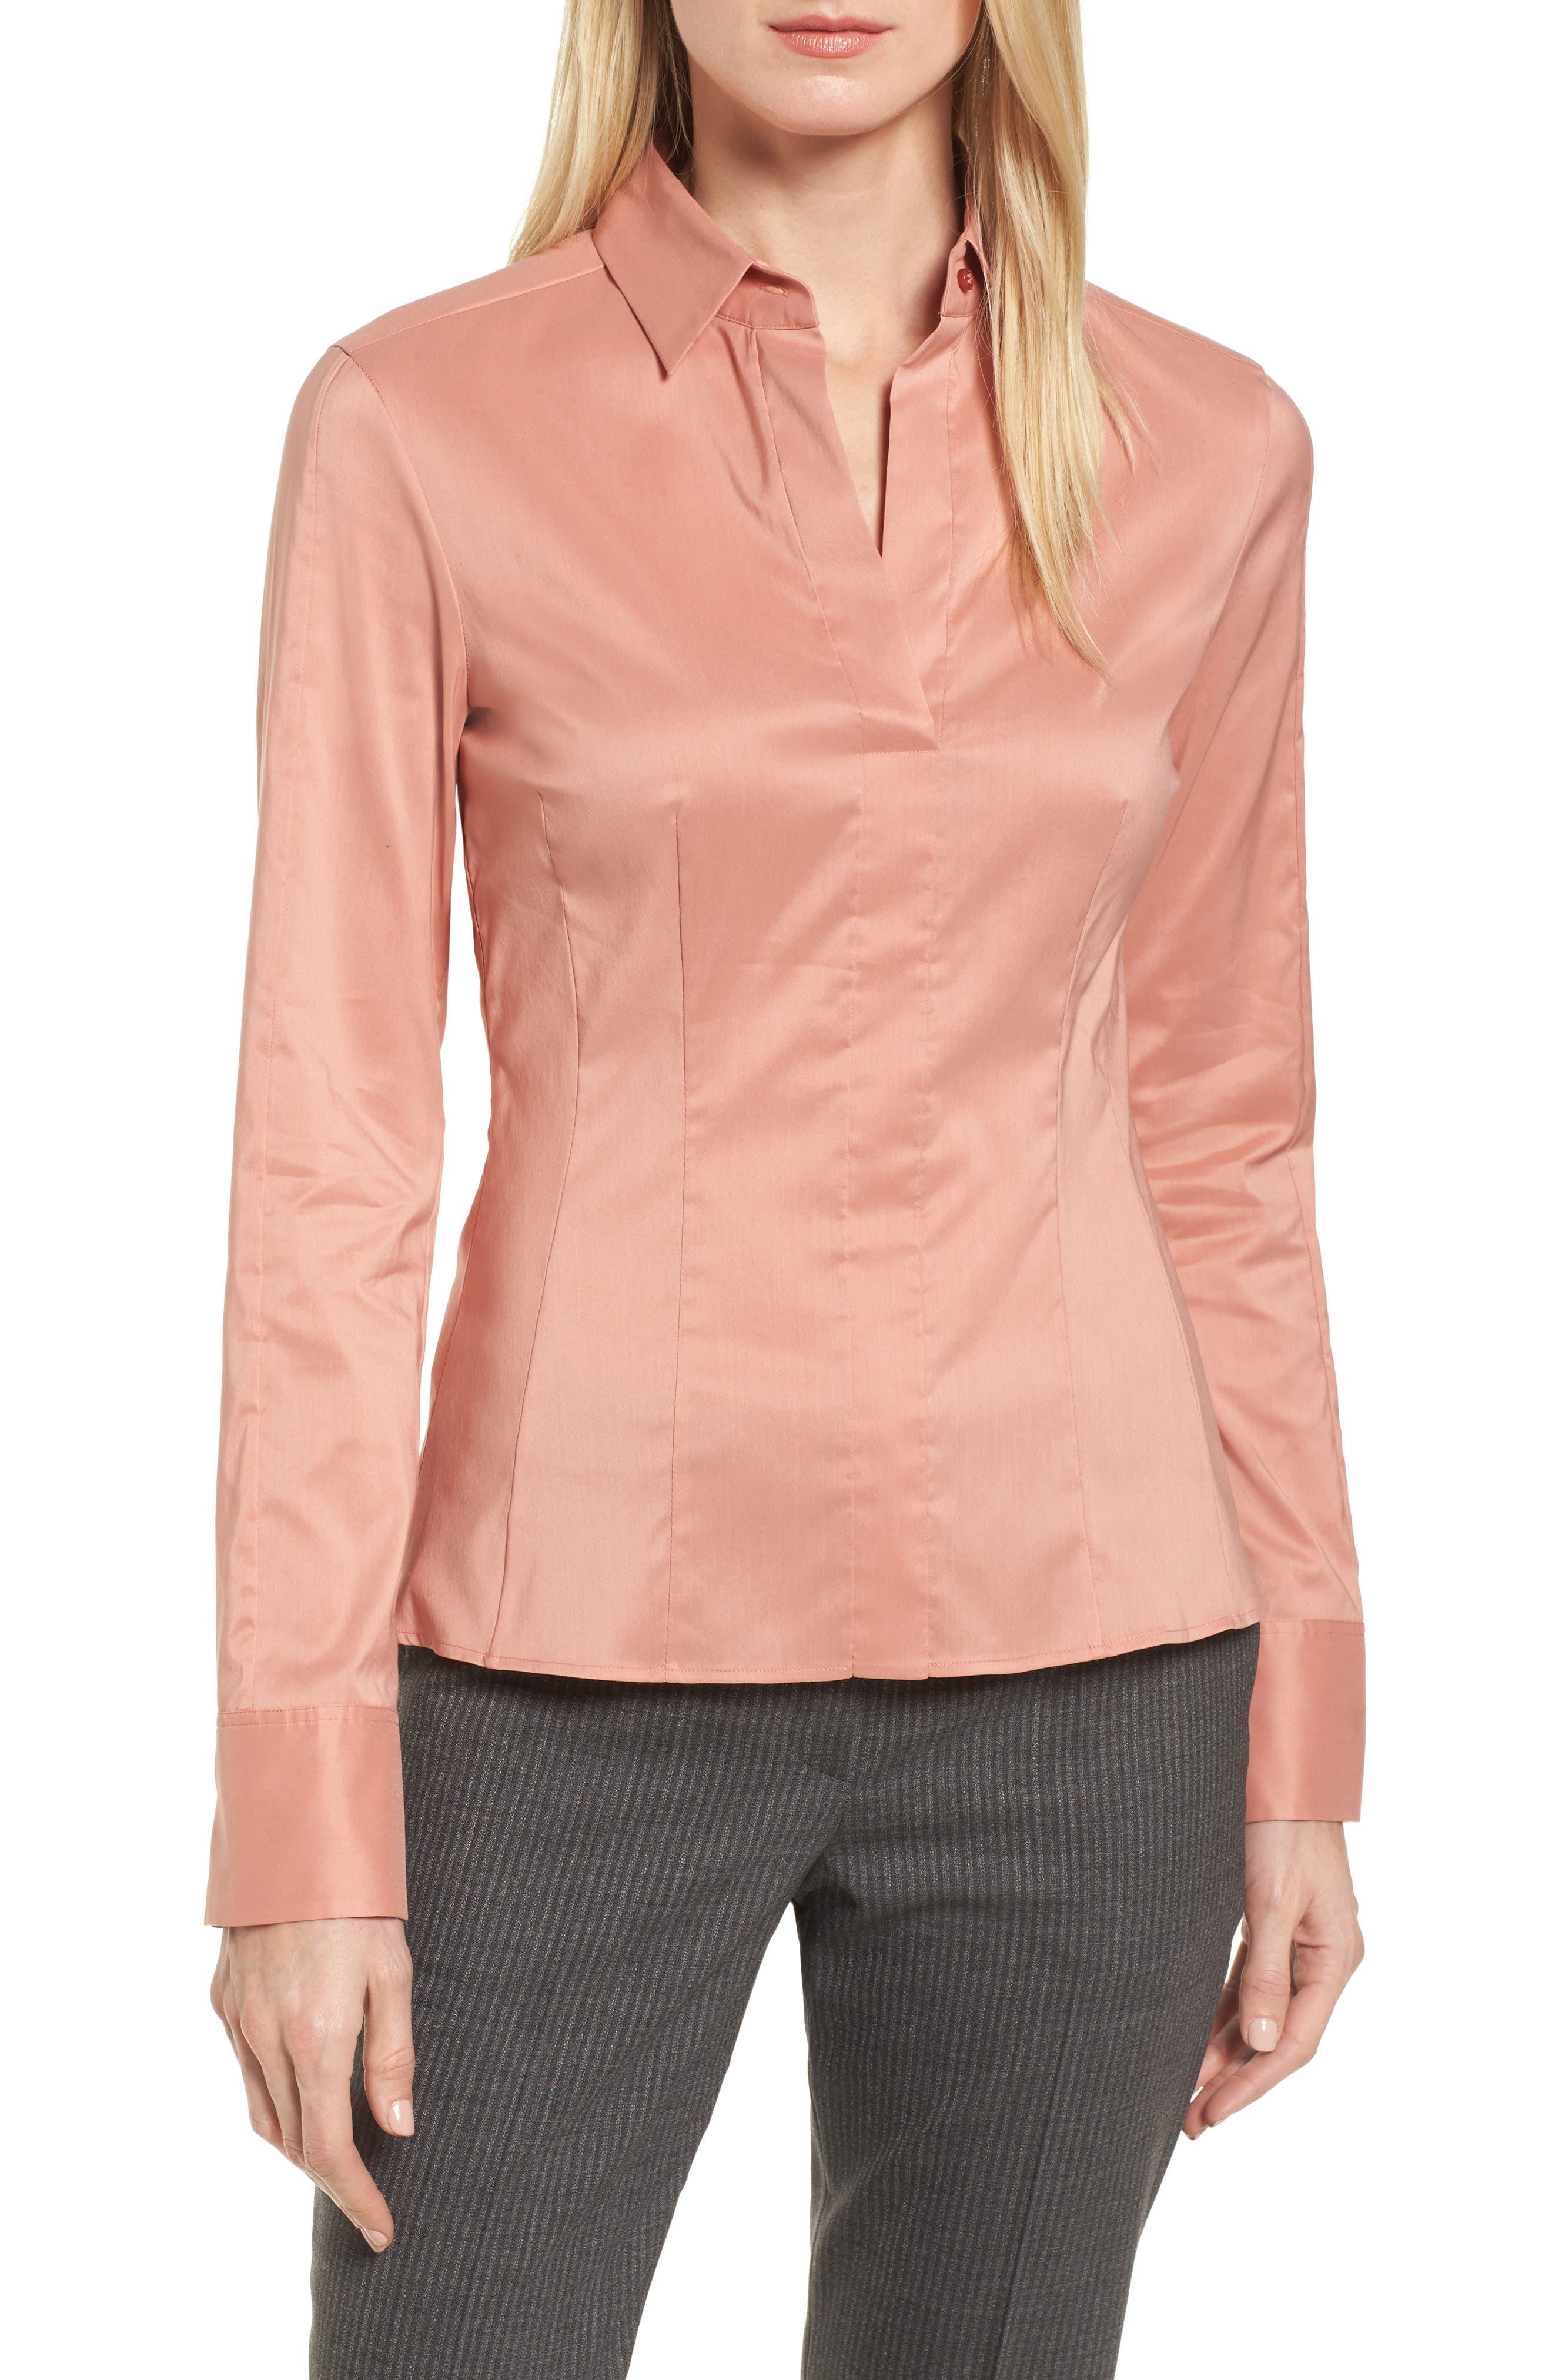 Alternate Image 1 Selected - BOSS Bashina Fitted Stretch Poplin Shirt (Petite)